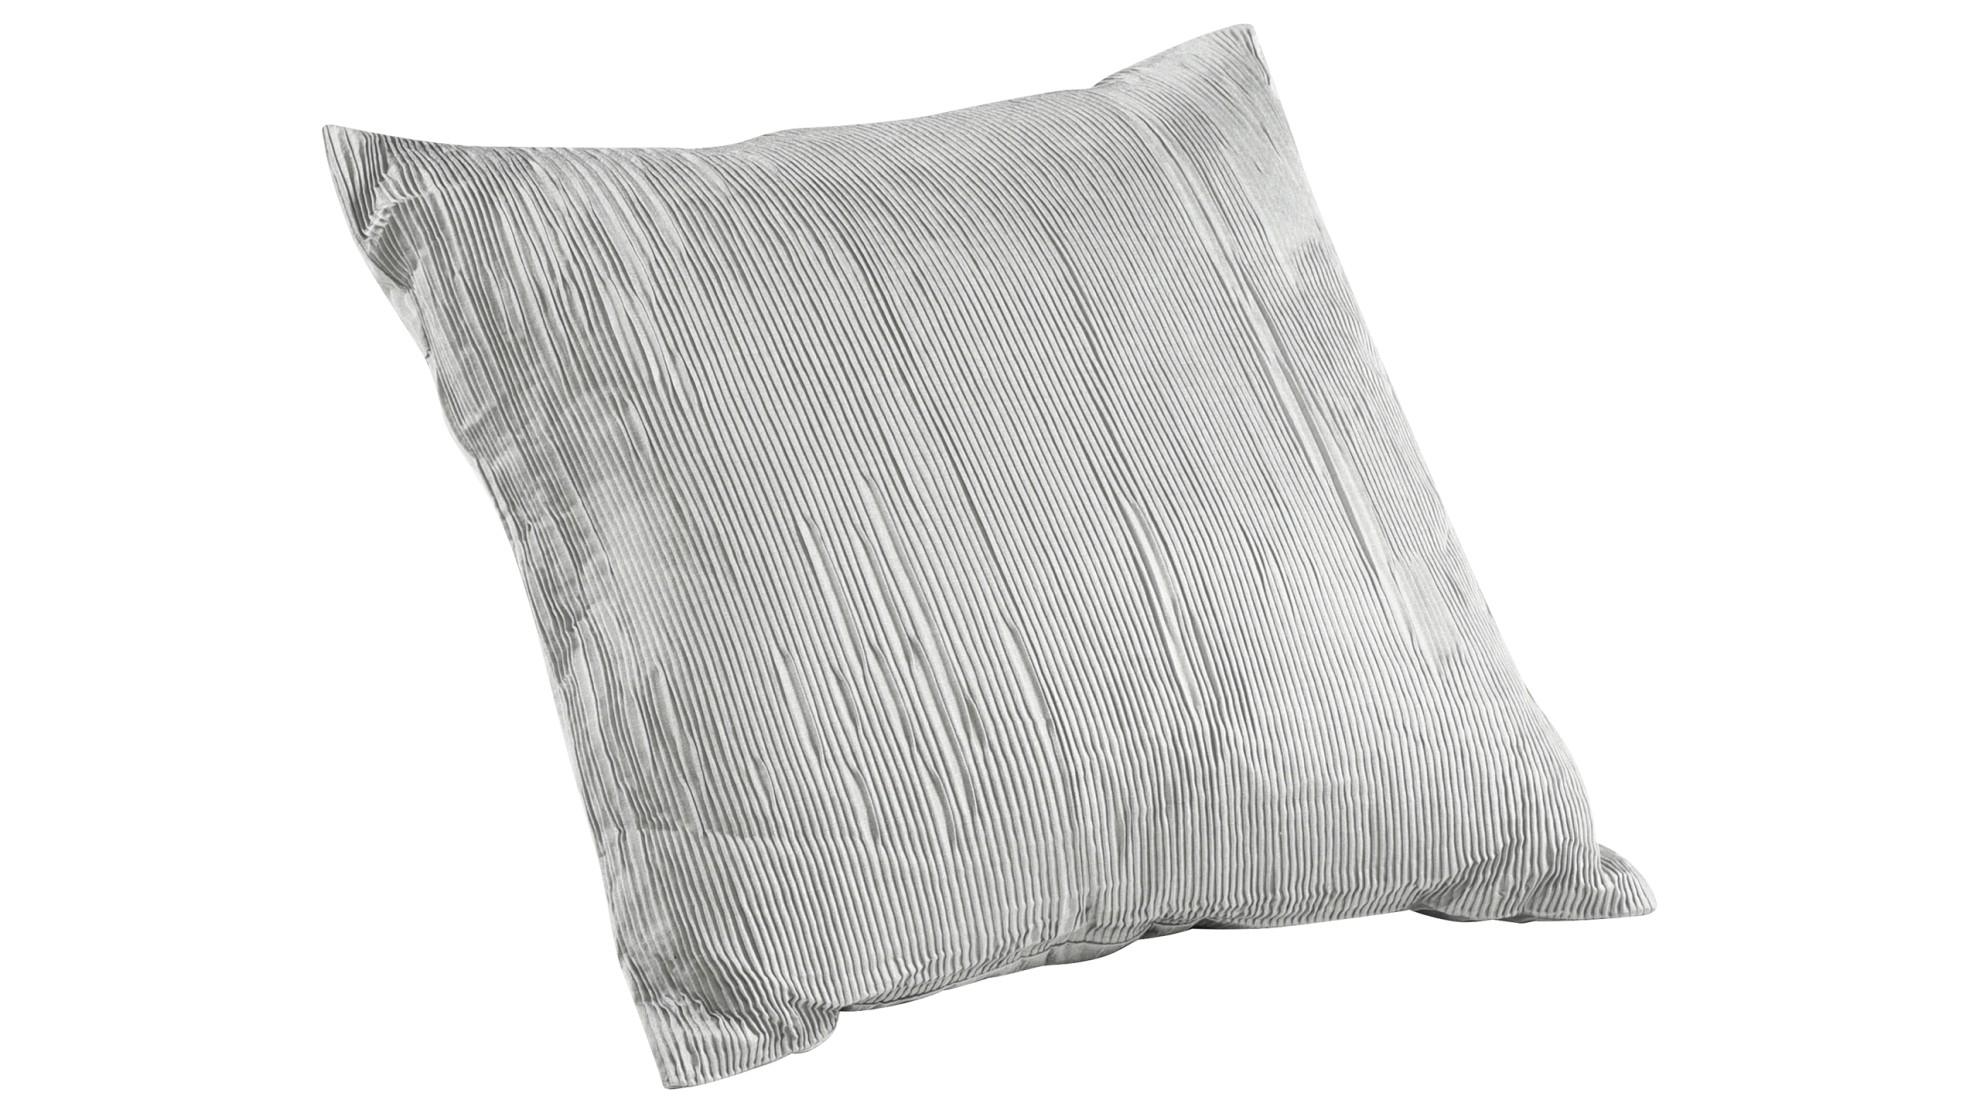 LILJA tyyny, 45 x 45 cm (musta) Sisustustyynyt ja